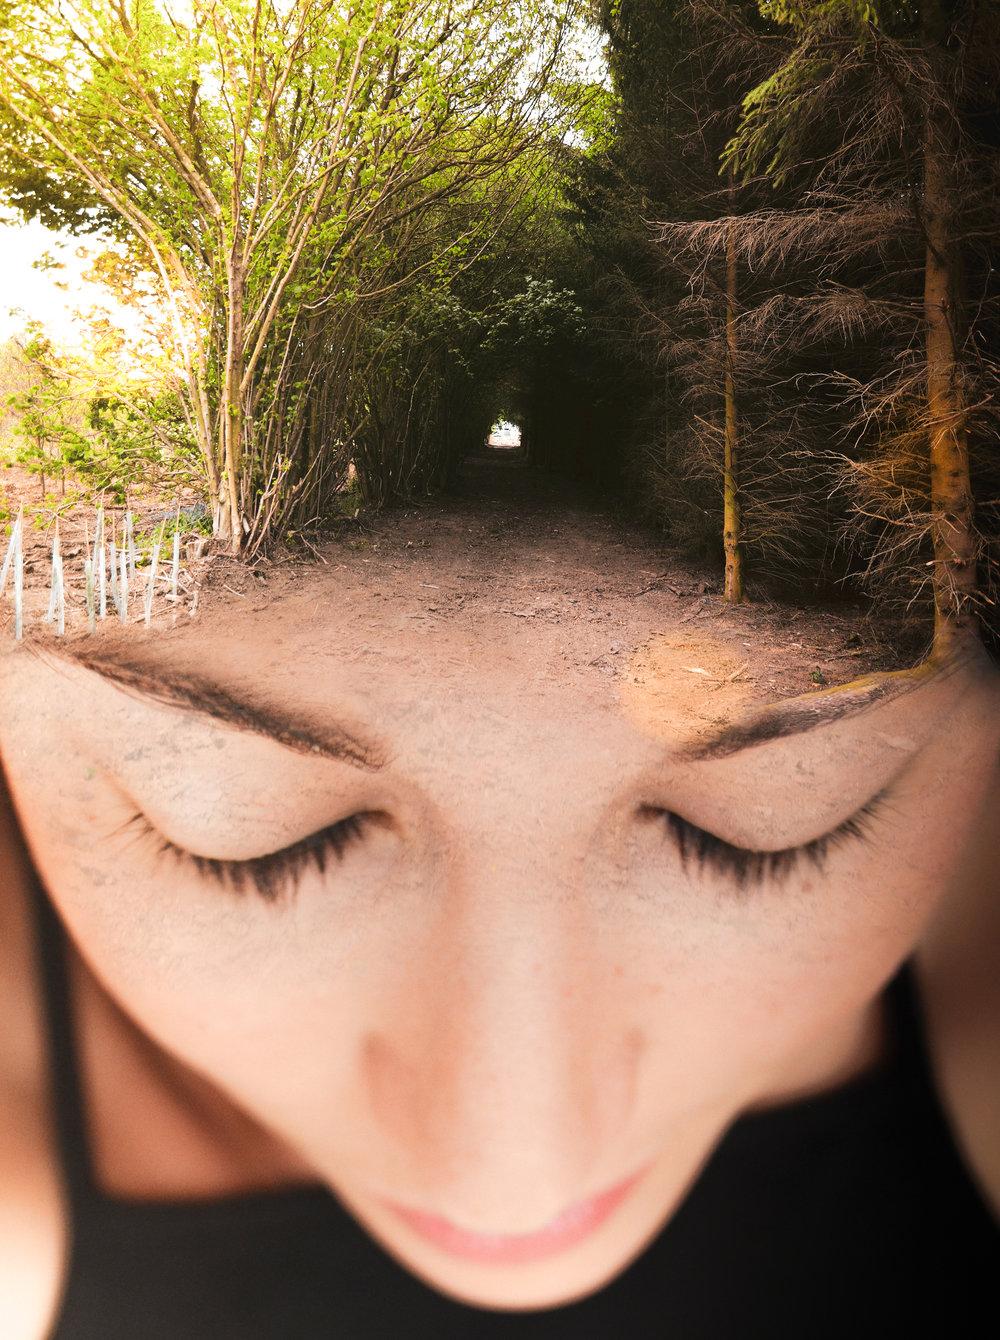 Mindfullness meditation